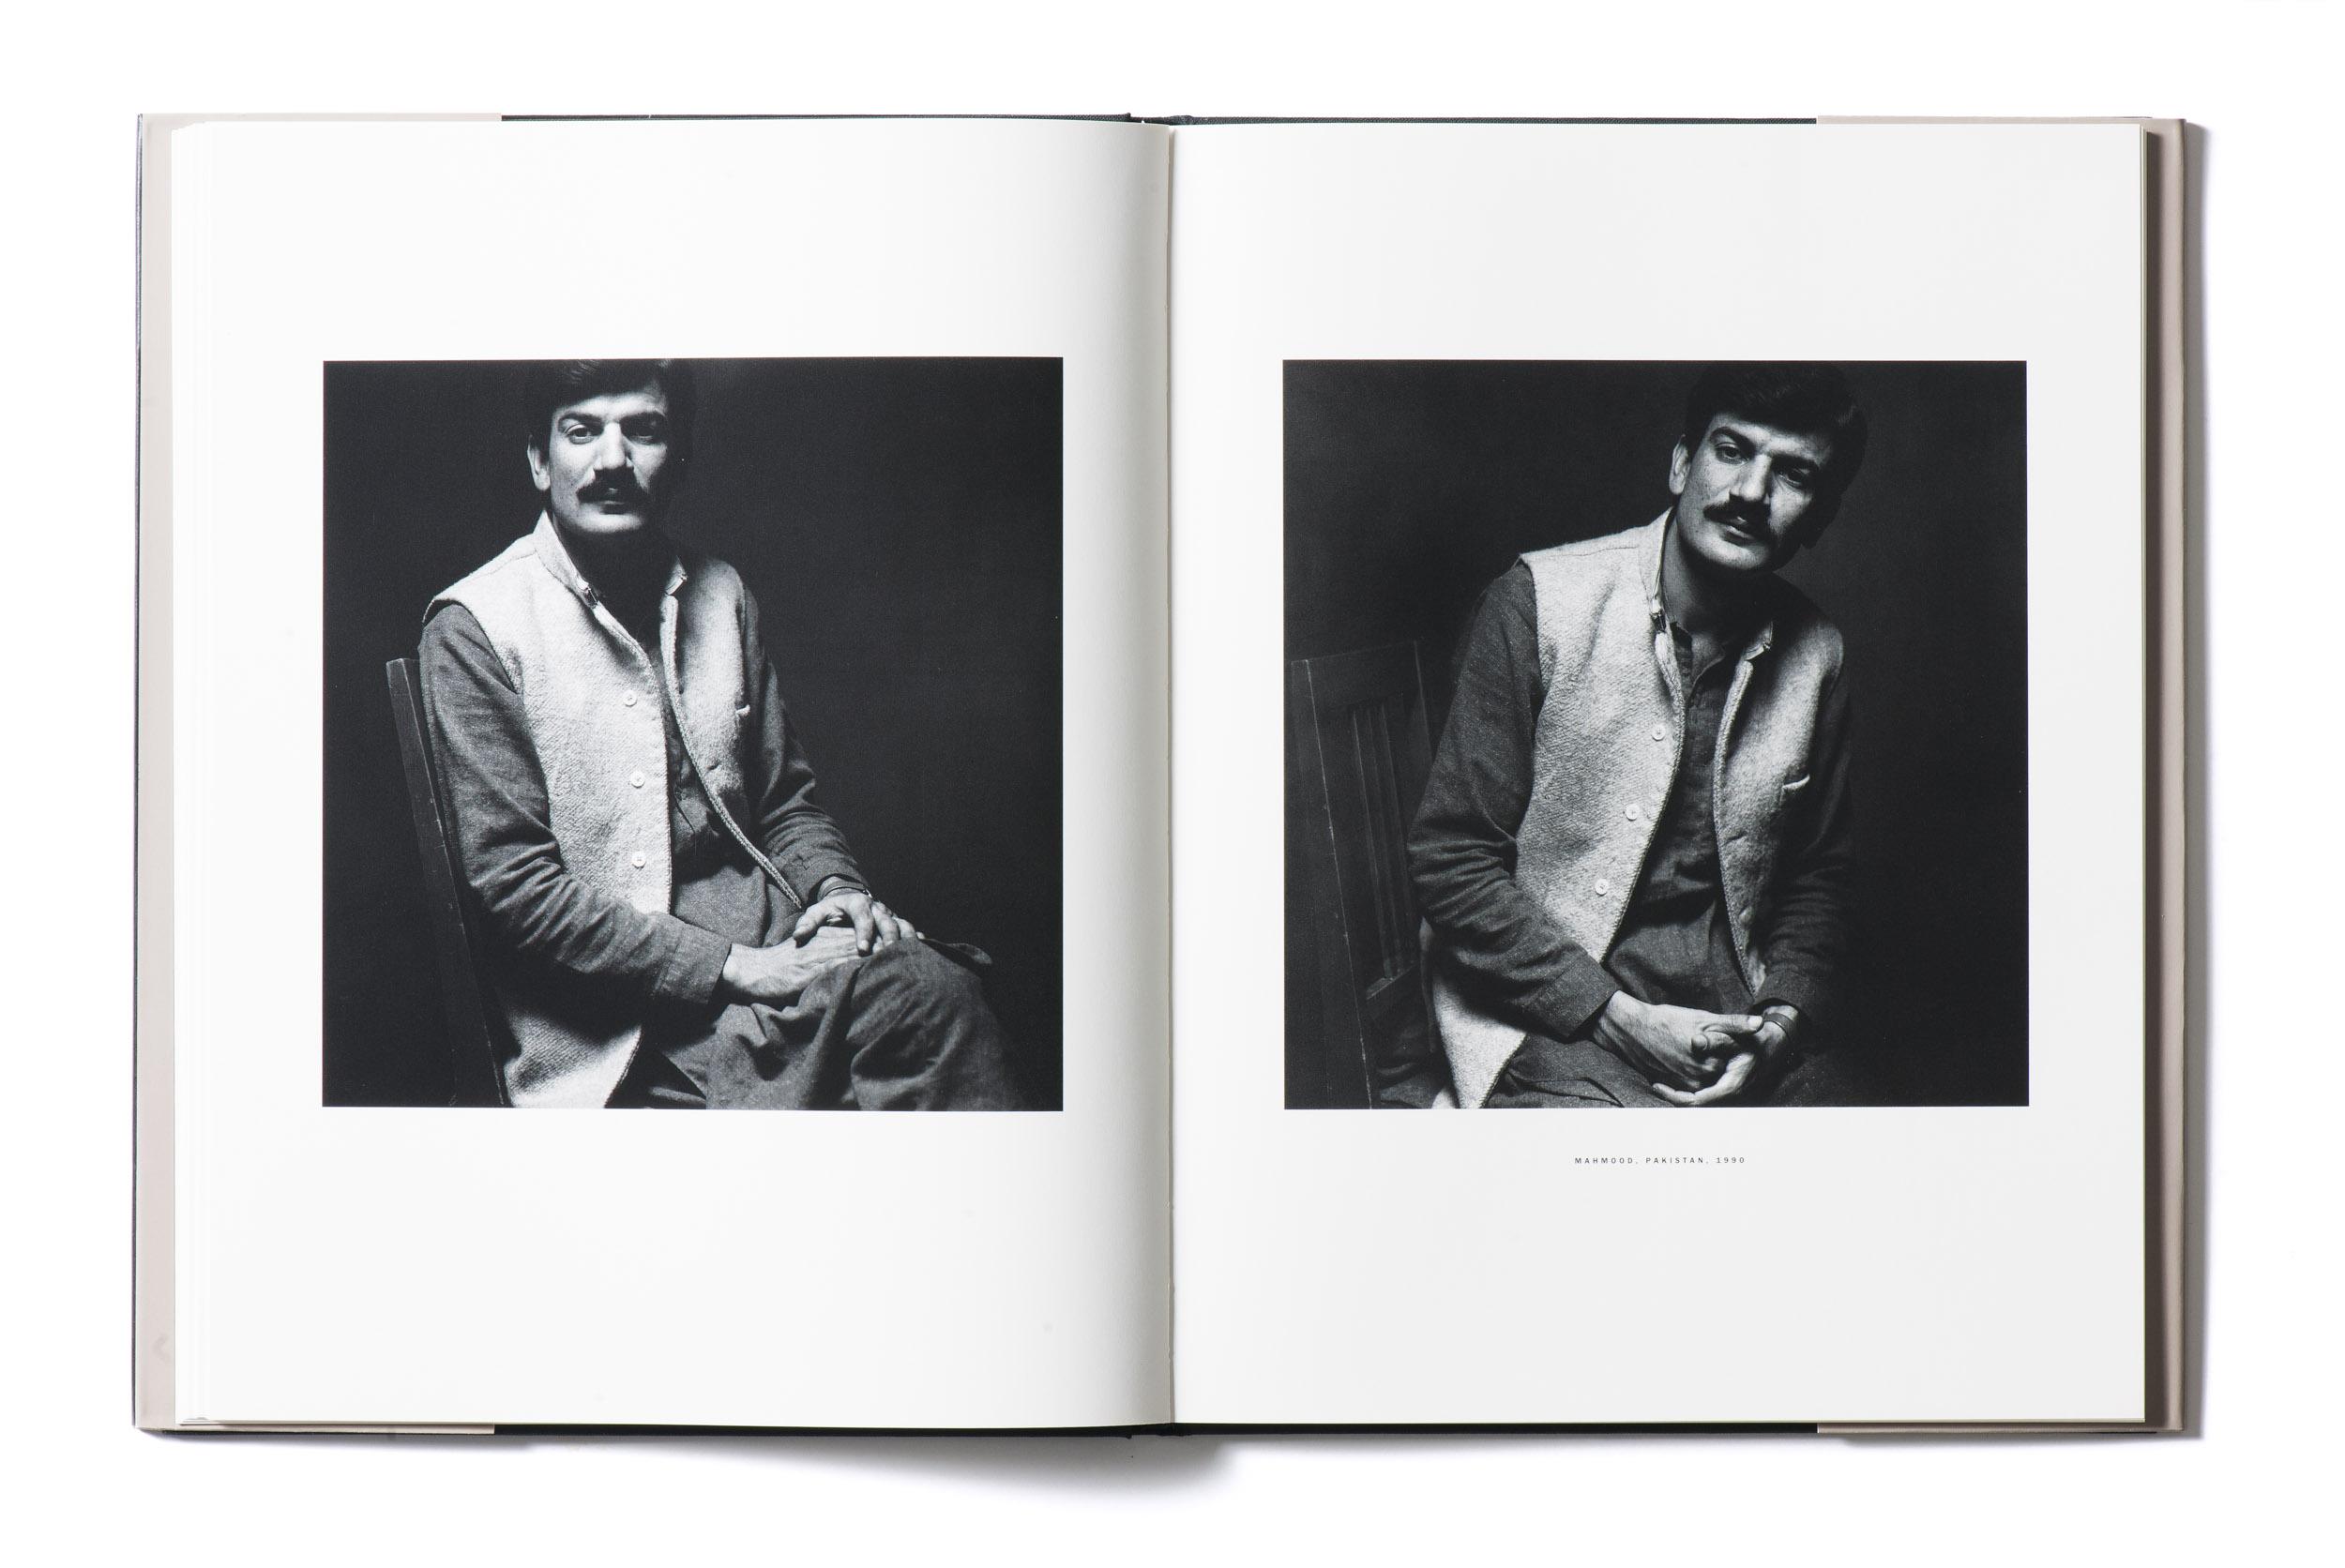 Kunstband Fotografien Peter Hebeisen Titel Feindbilder #5